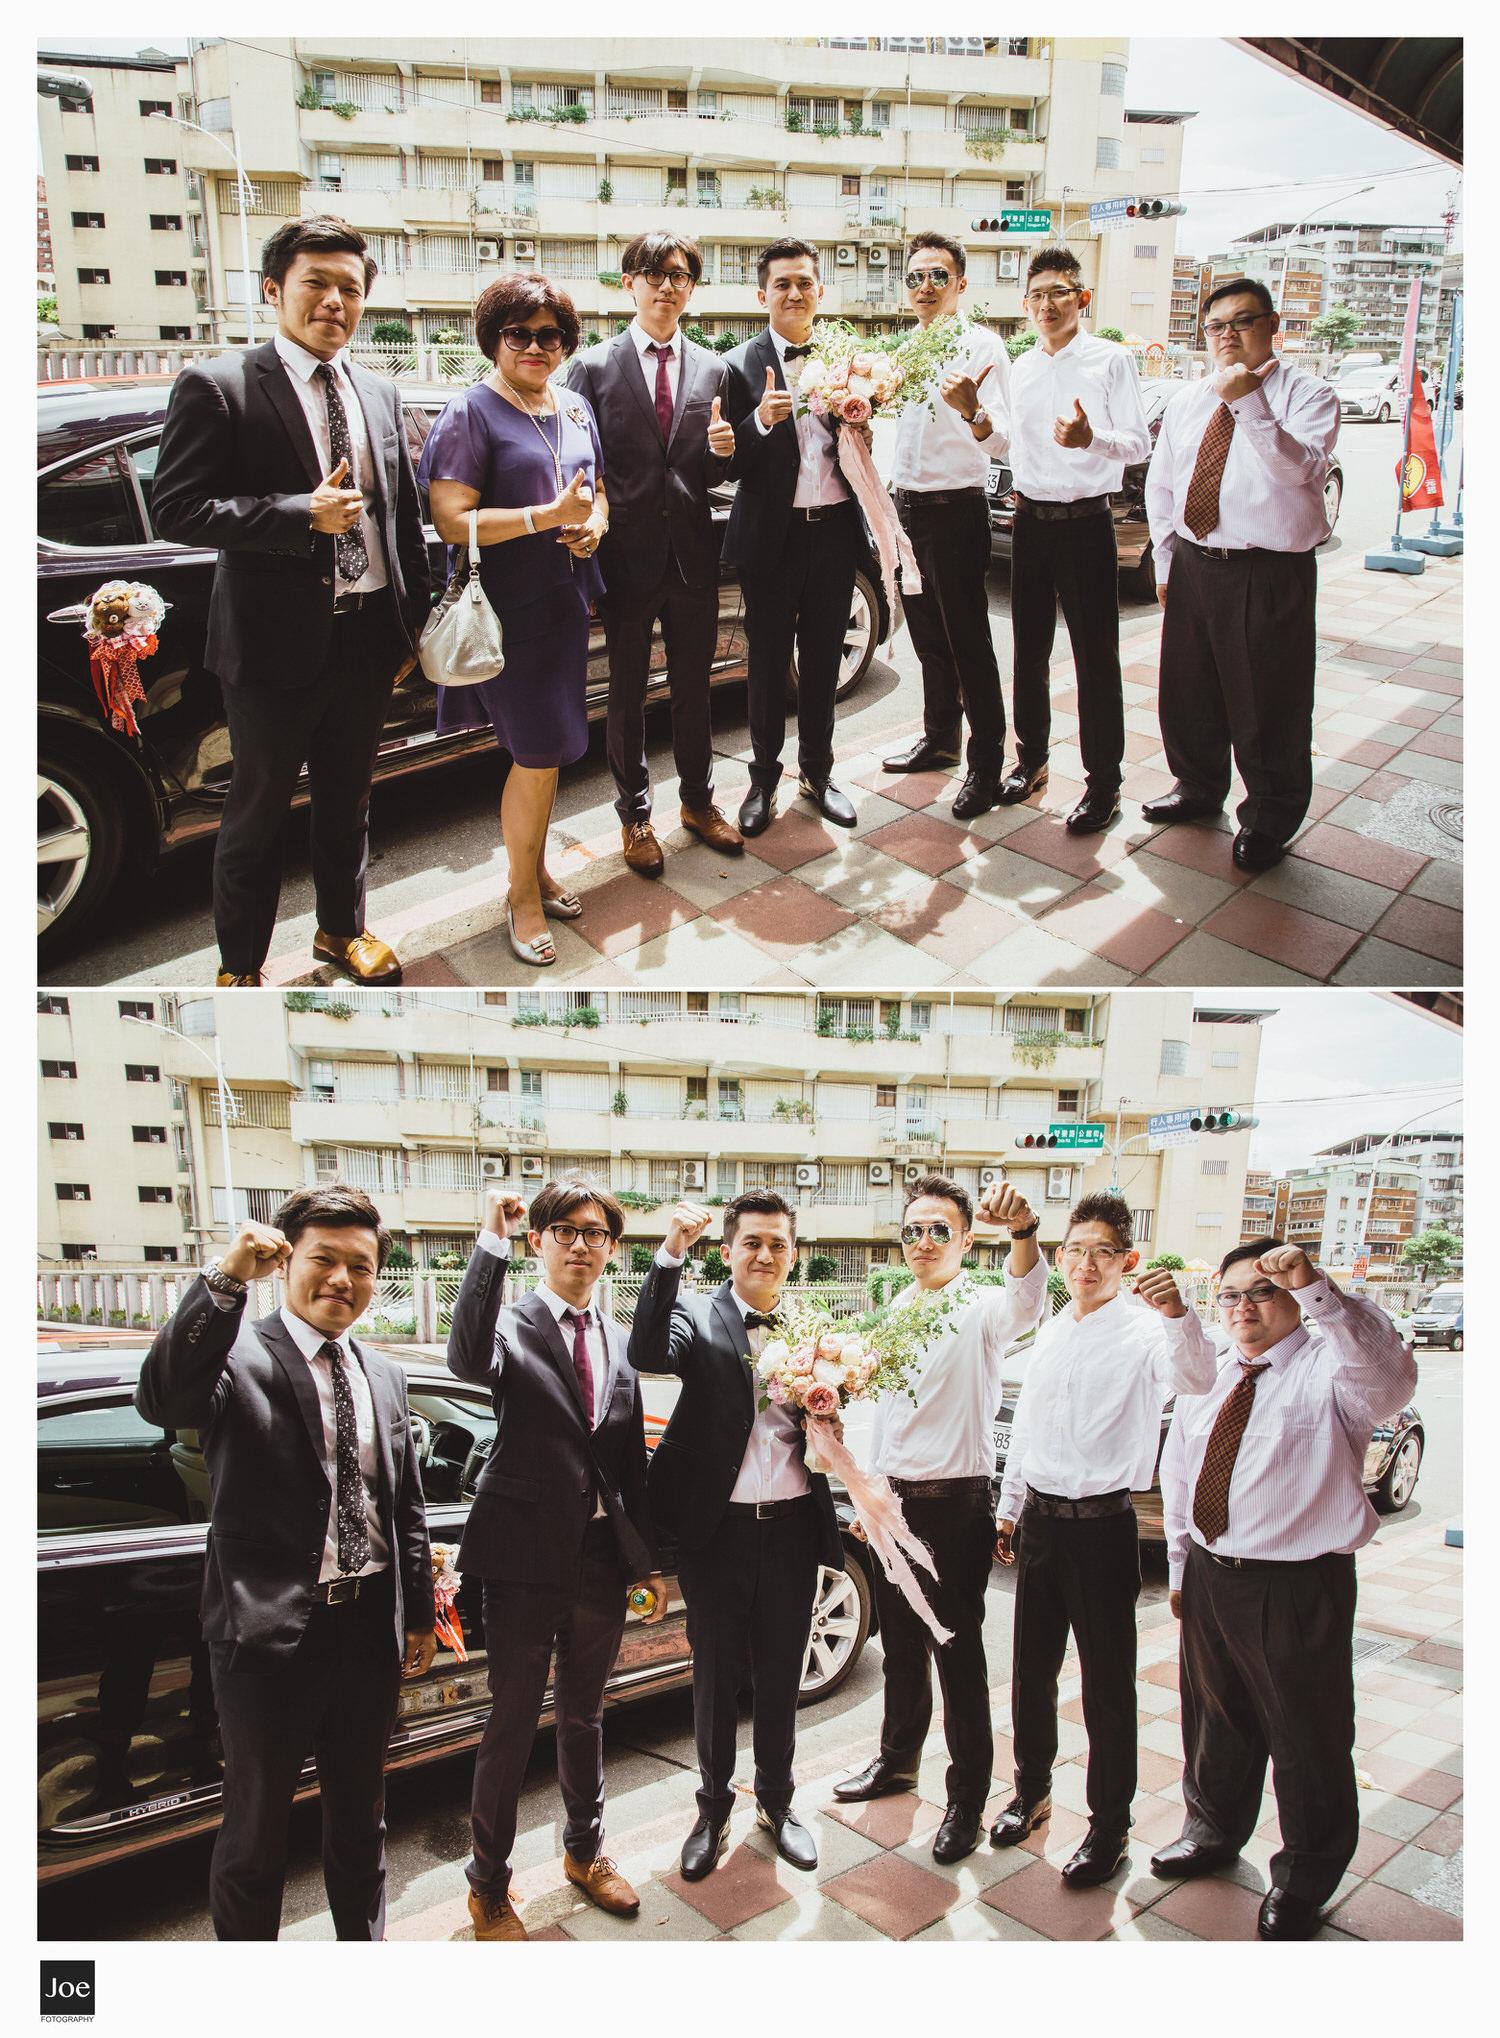 wedding-photography-shangri-la-far-eastern-plaza-hotel-ariel-sam-joe-fotography-027.jpg